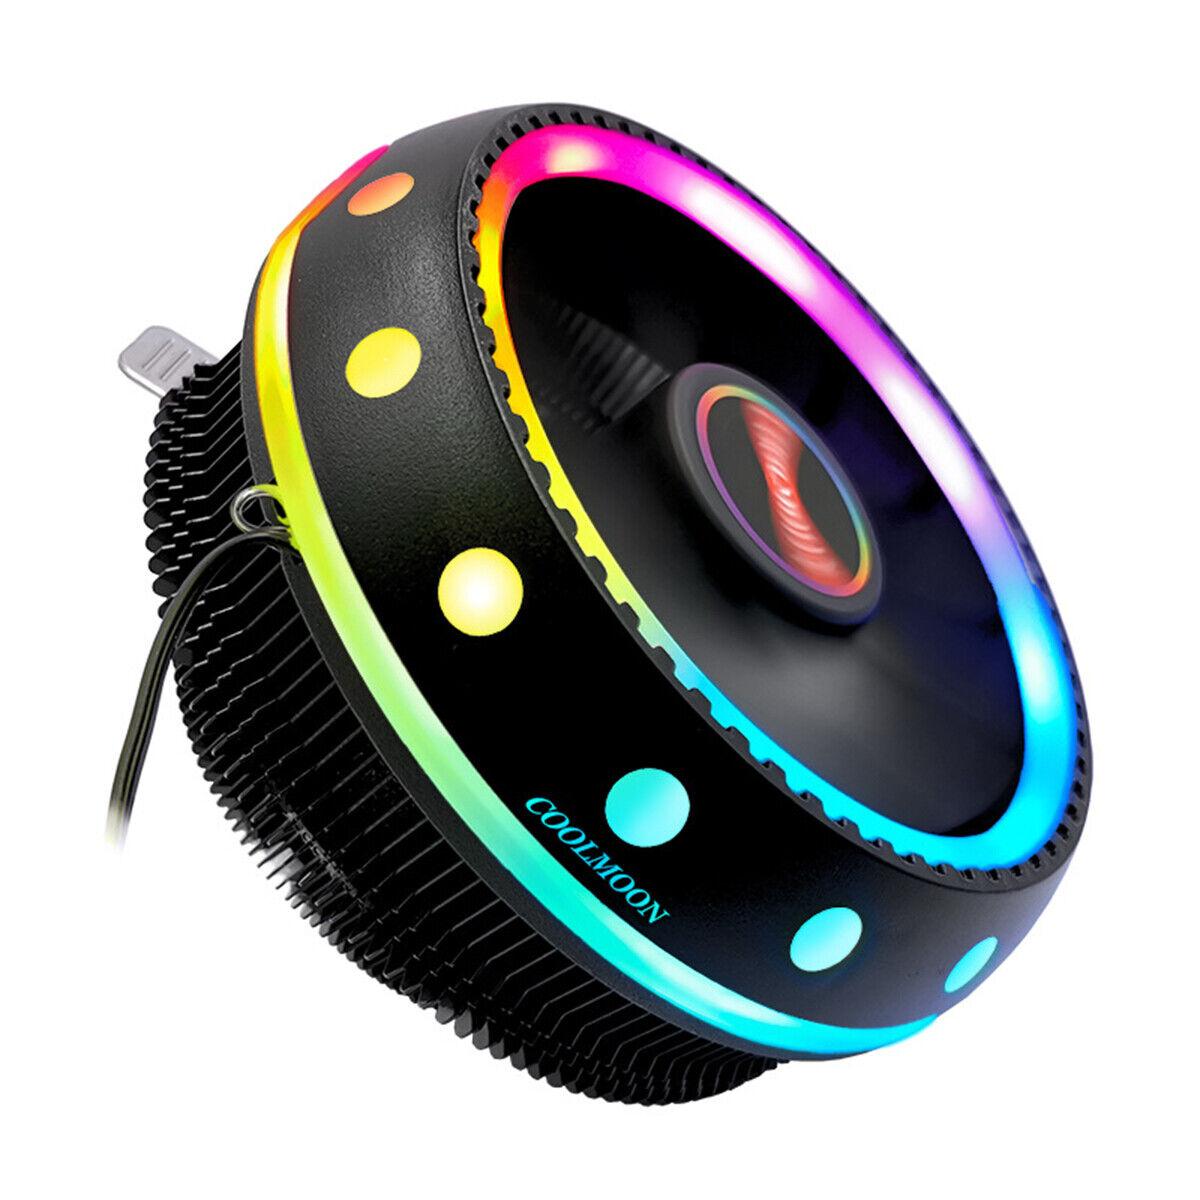 RGB CPU Cooler LED Air Heatsink Intel AMD PC Processor Deskt